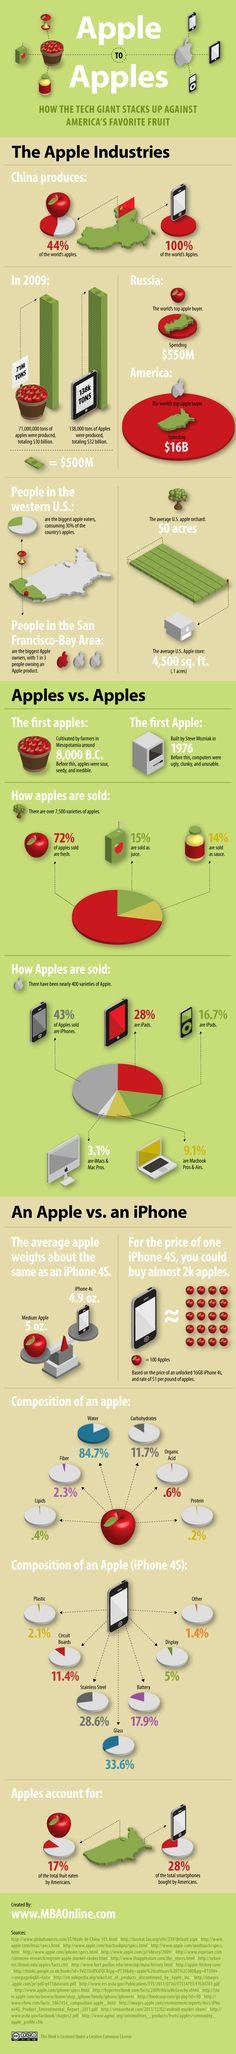 Apples (Fruit) to Apple (Company) Comparison!